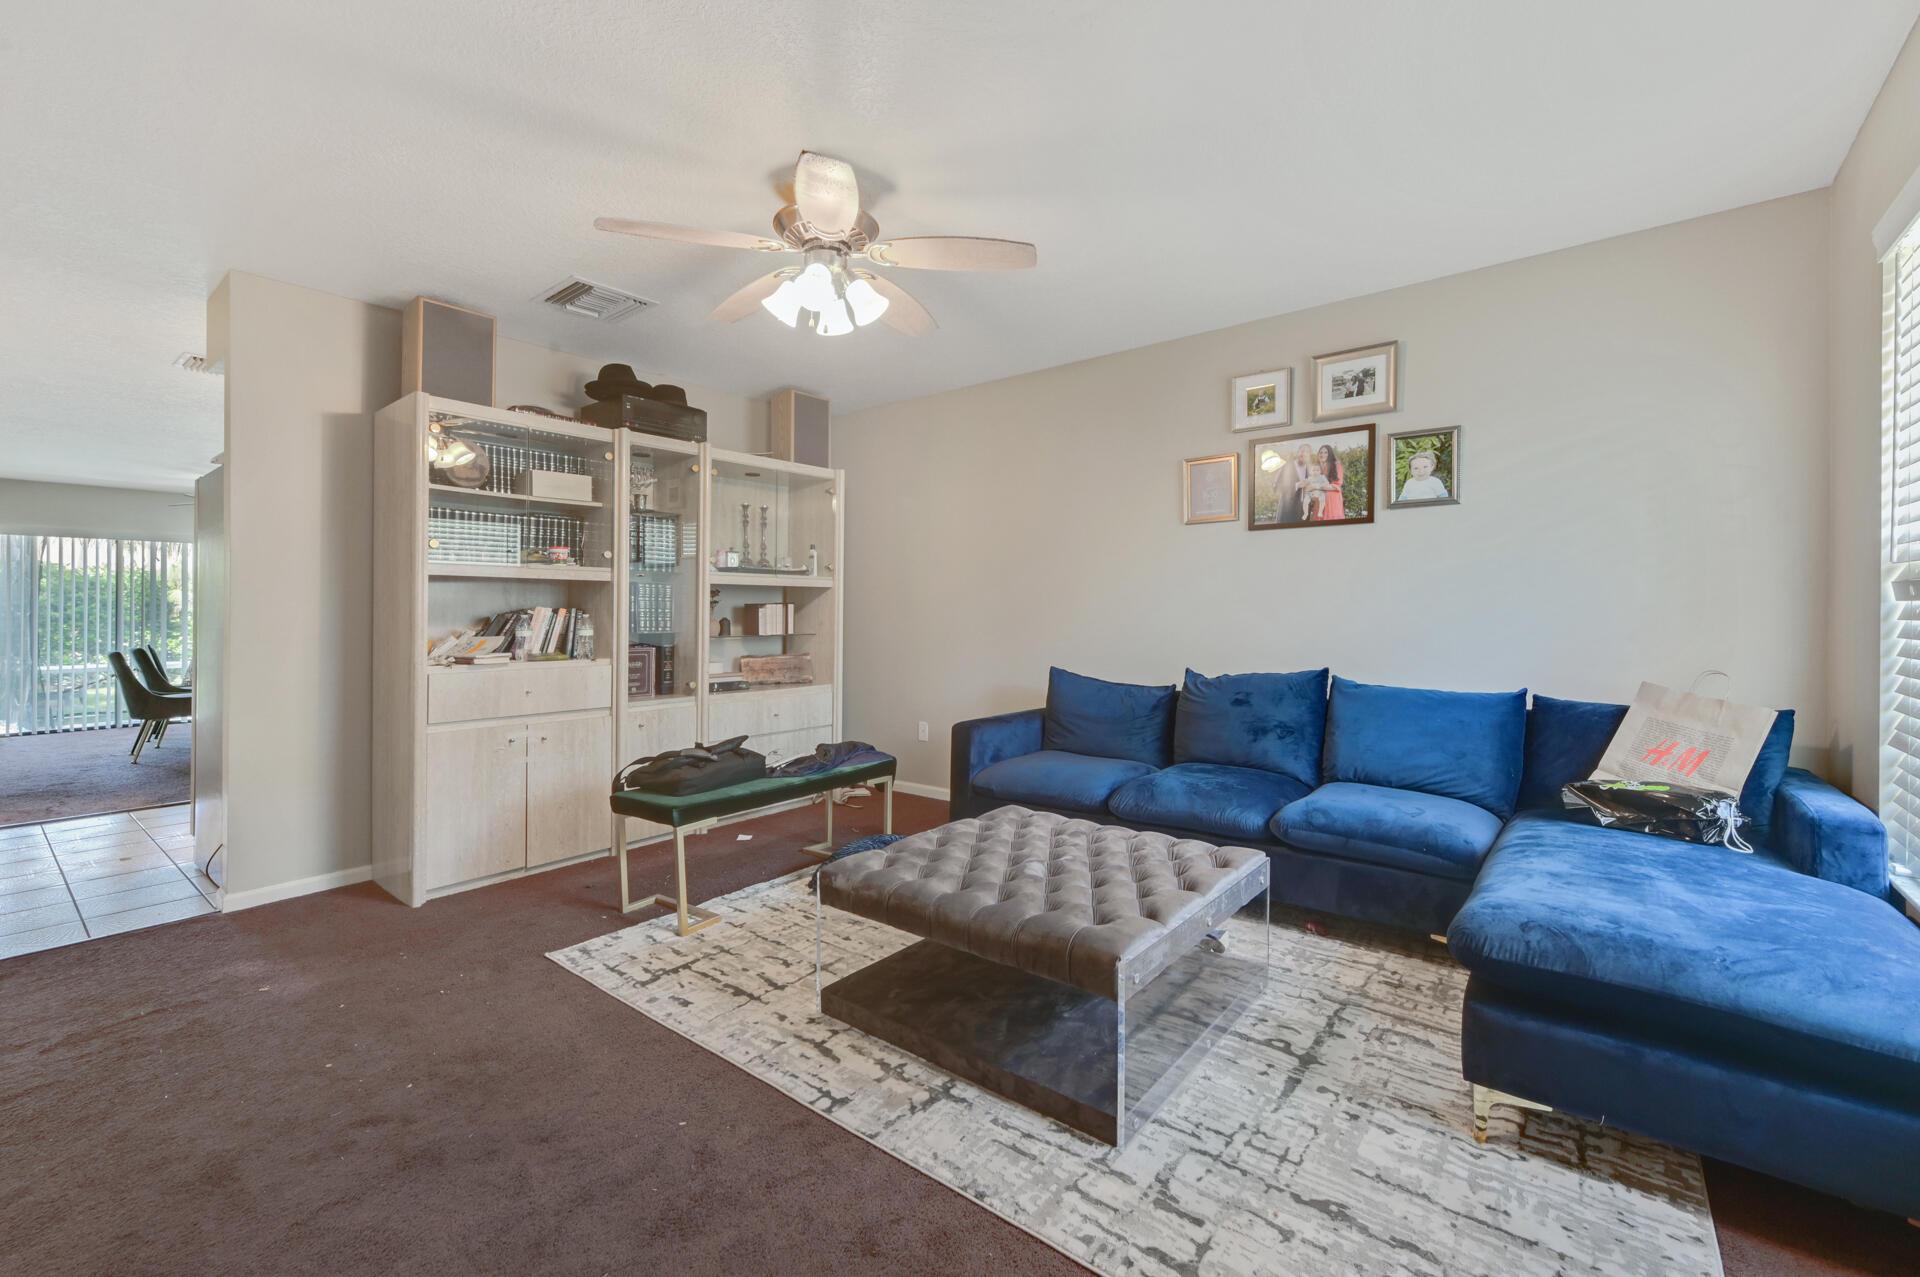 02 Living Room_003